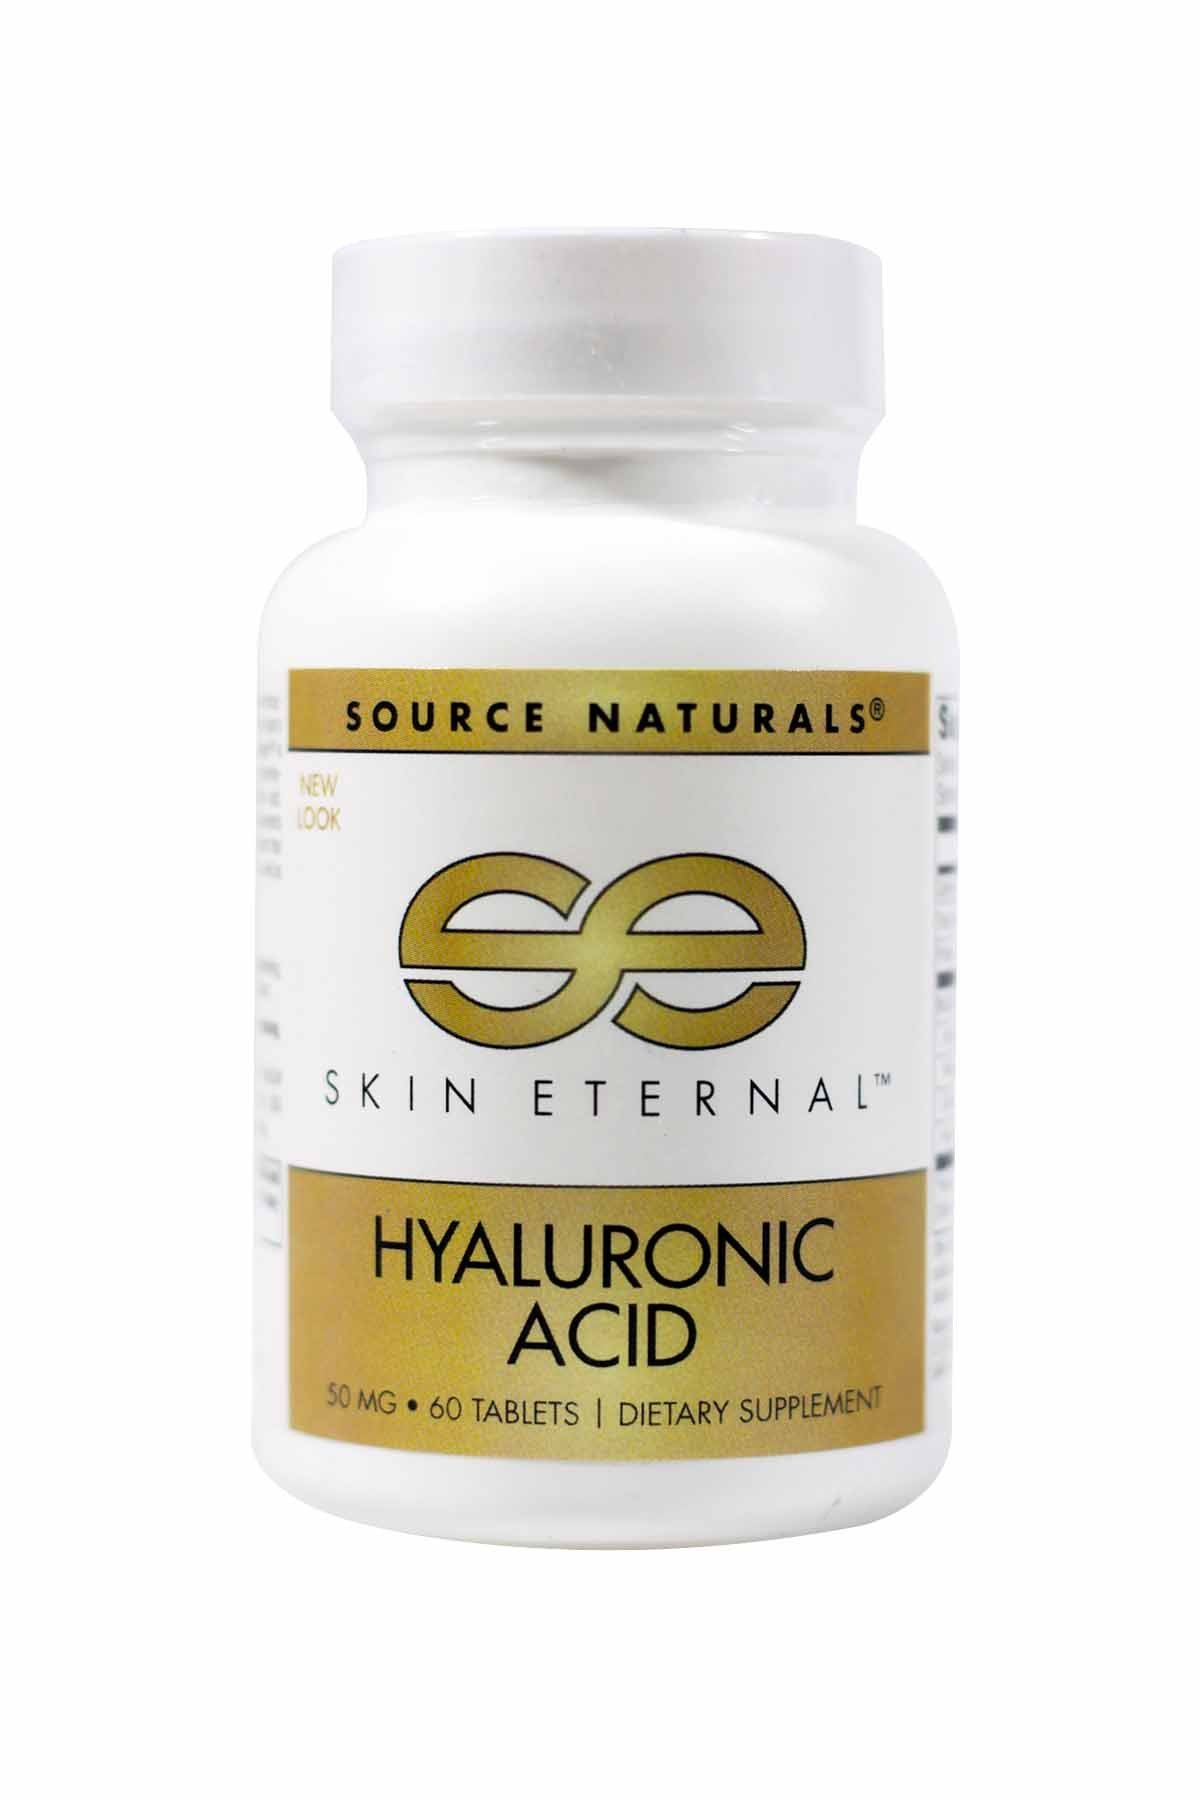 SOURCE NATURALS Skin Eternal Hyaluronic Acid Tablet, 60 Count